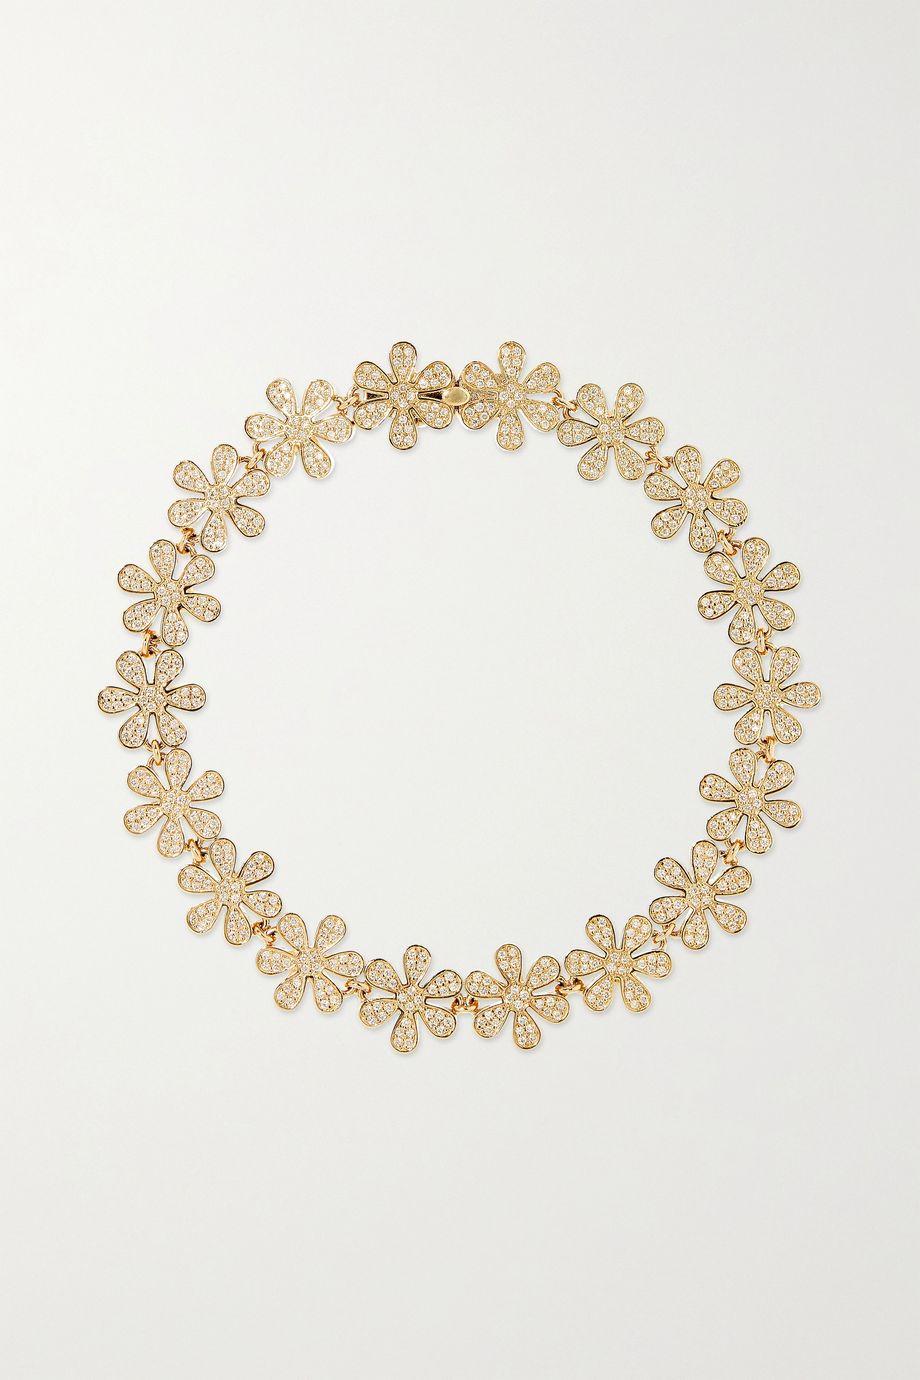 Sydney Evan Bracelet en or 14 carats et diamants Daisy